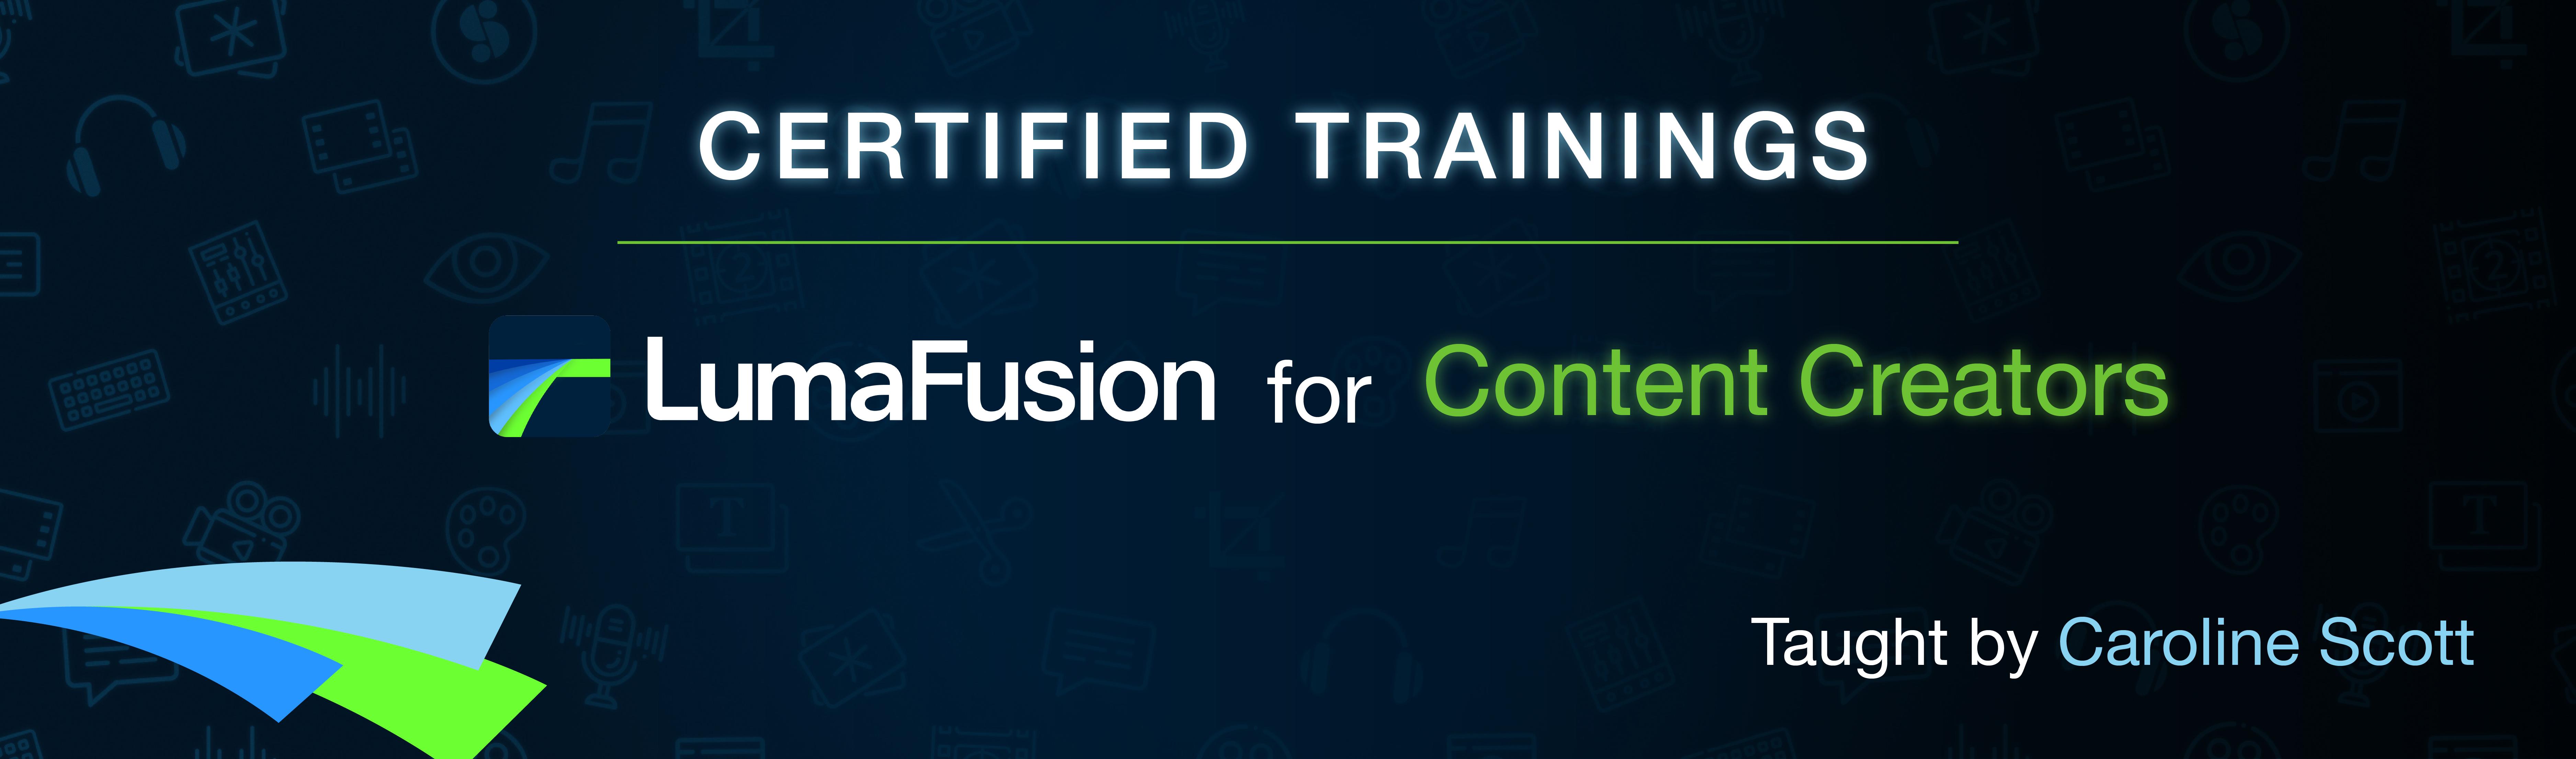 LumaFusion for Content Creators